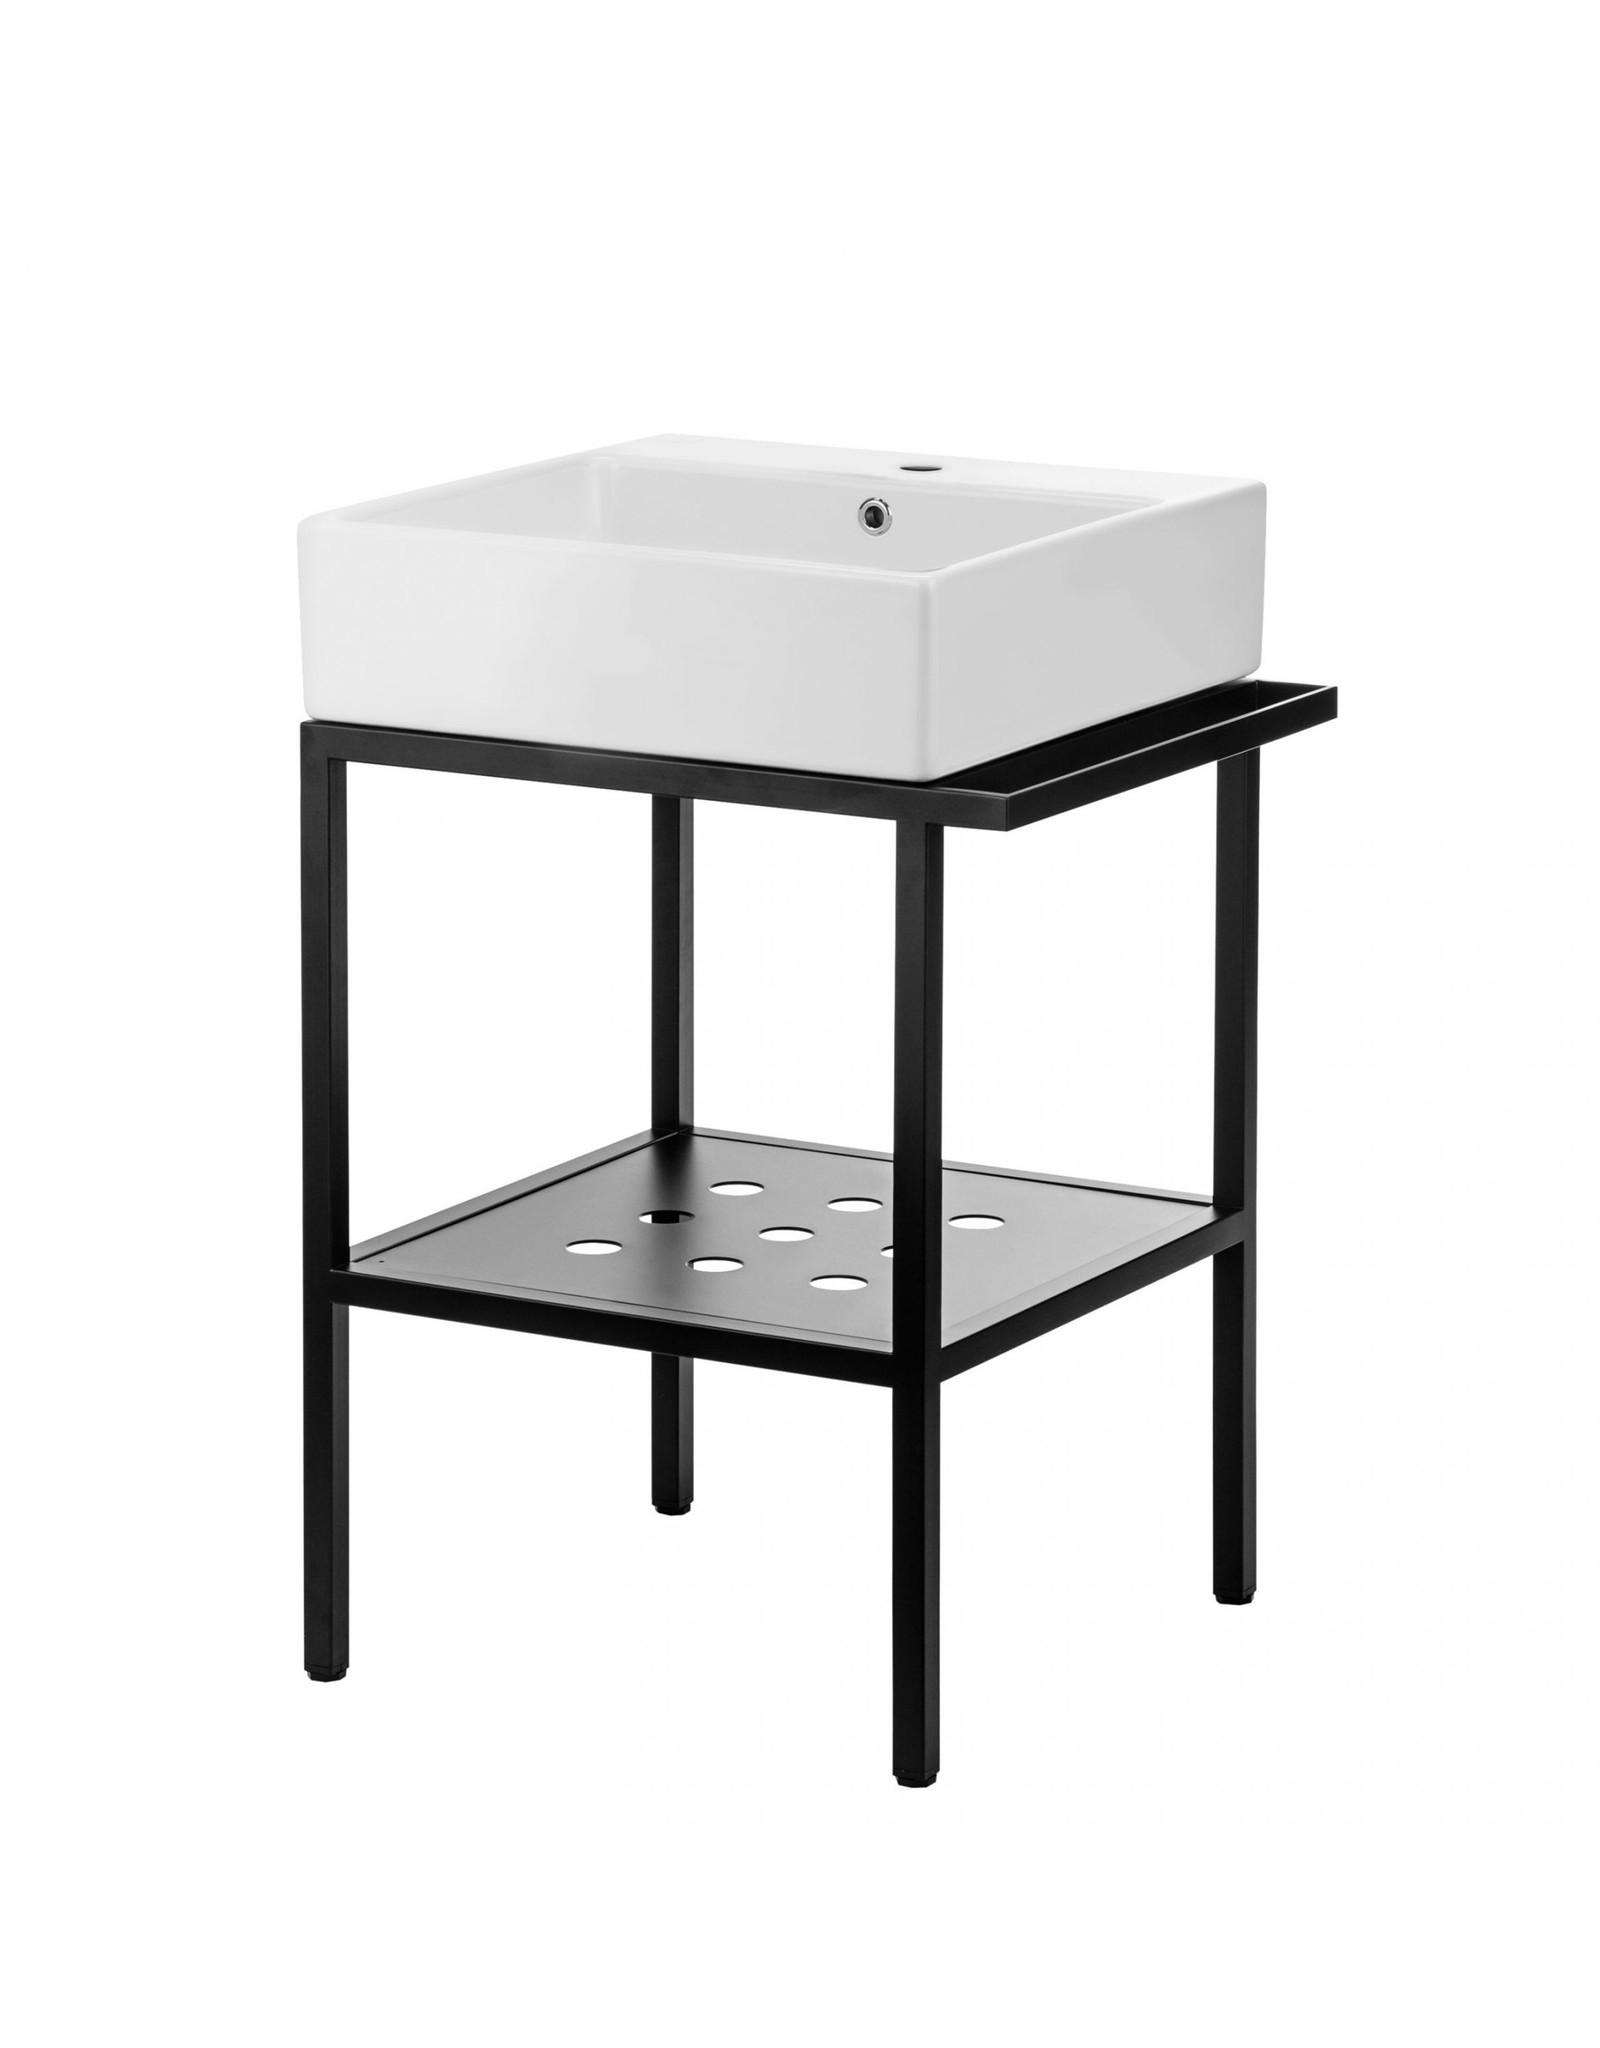 fabriecio Design bad meubel 50 x 50 cm